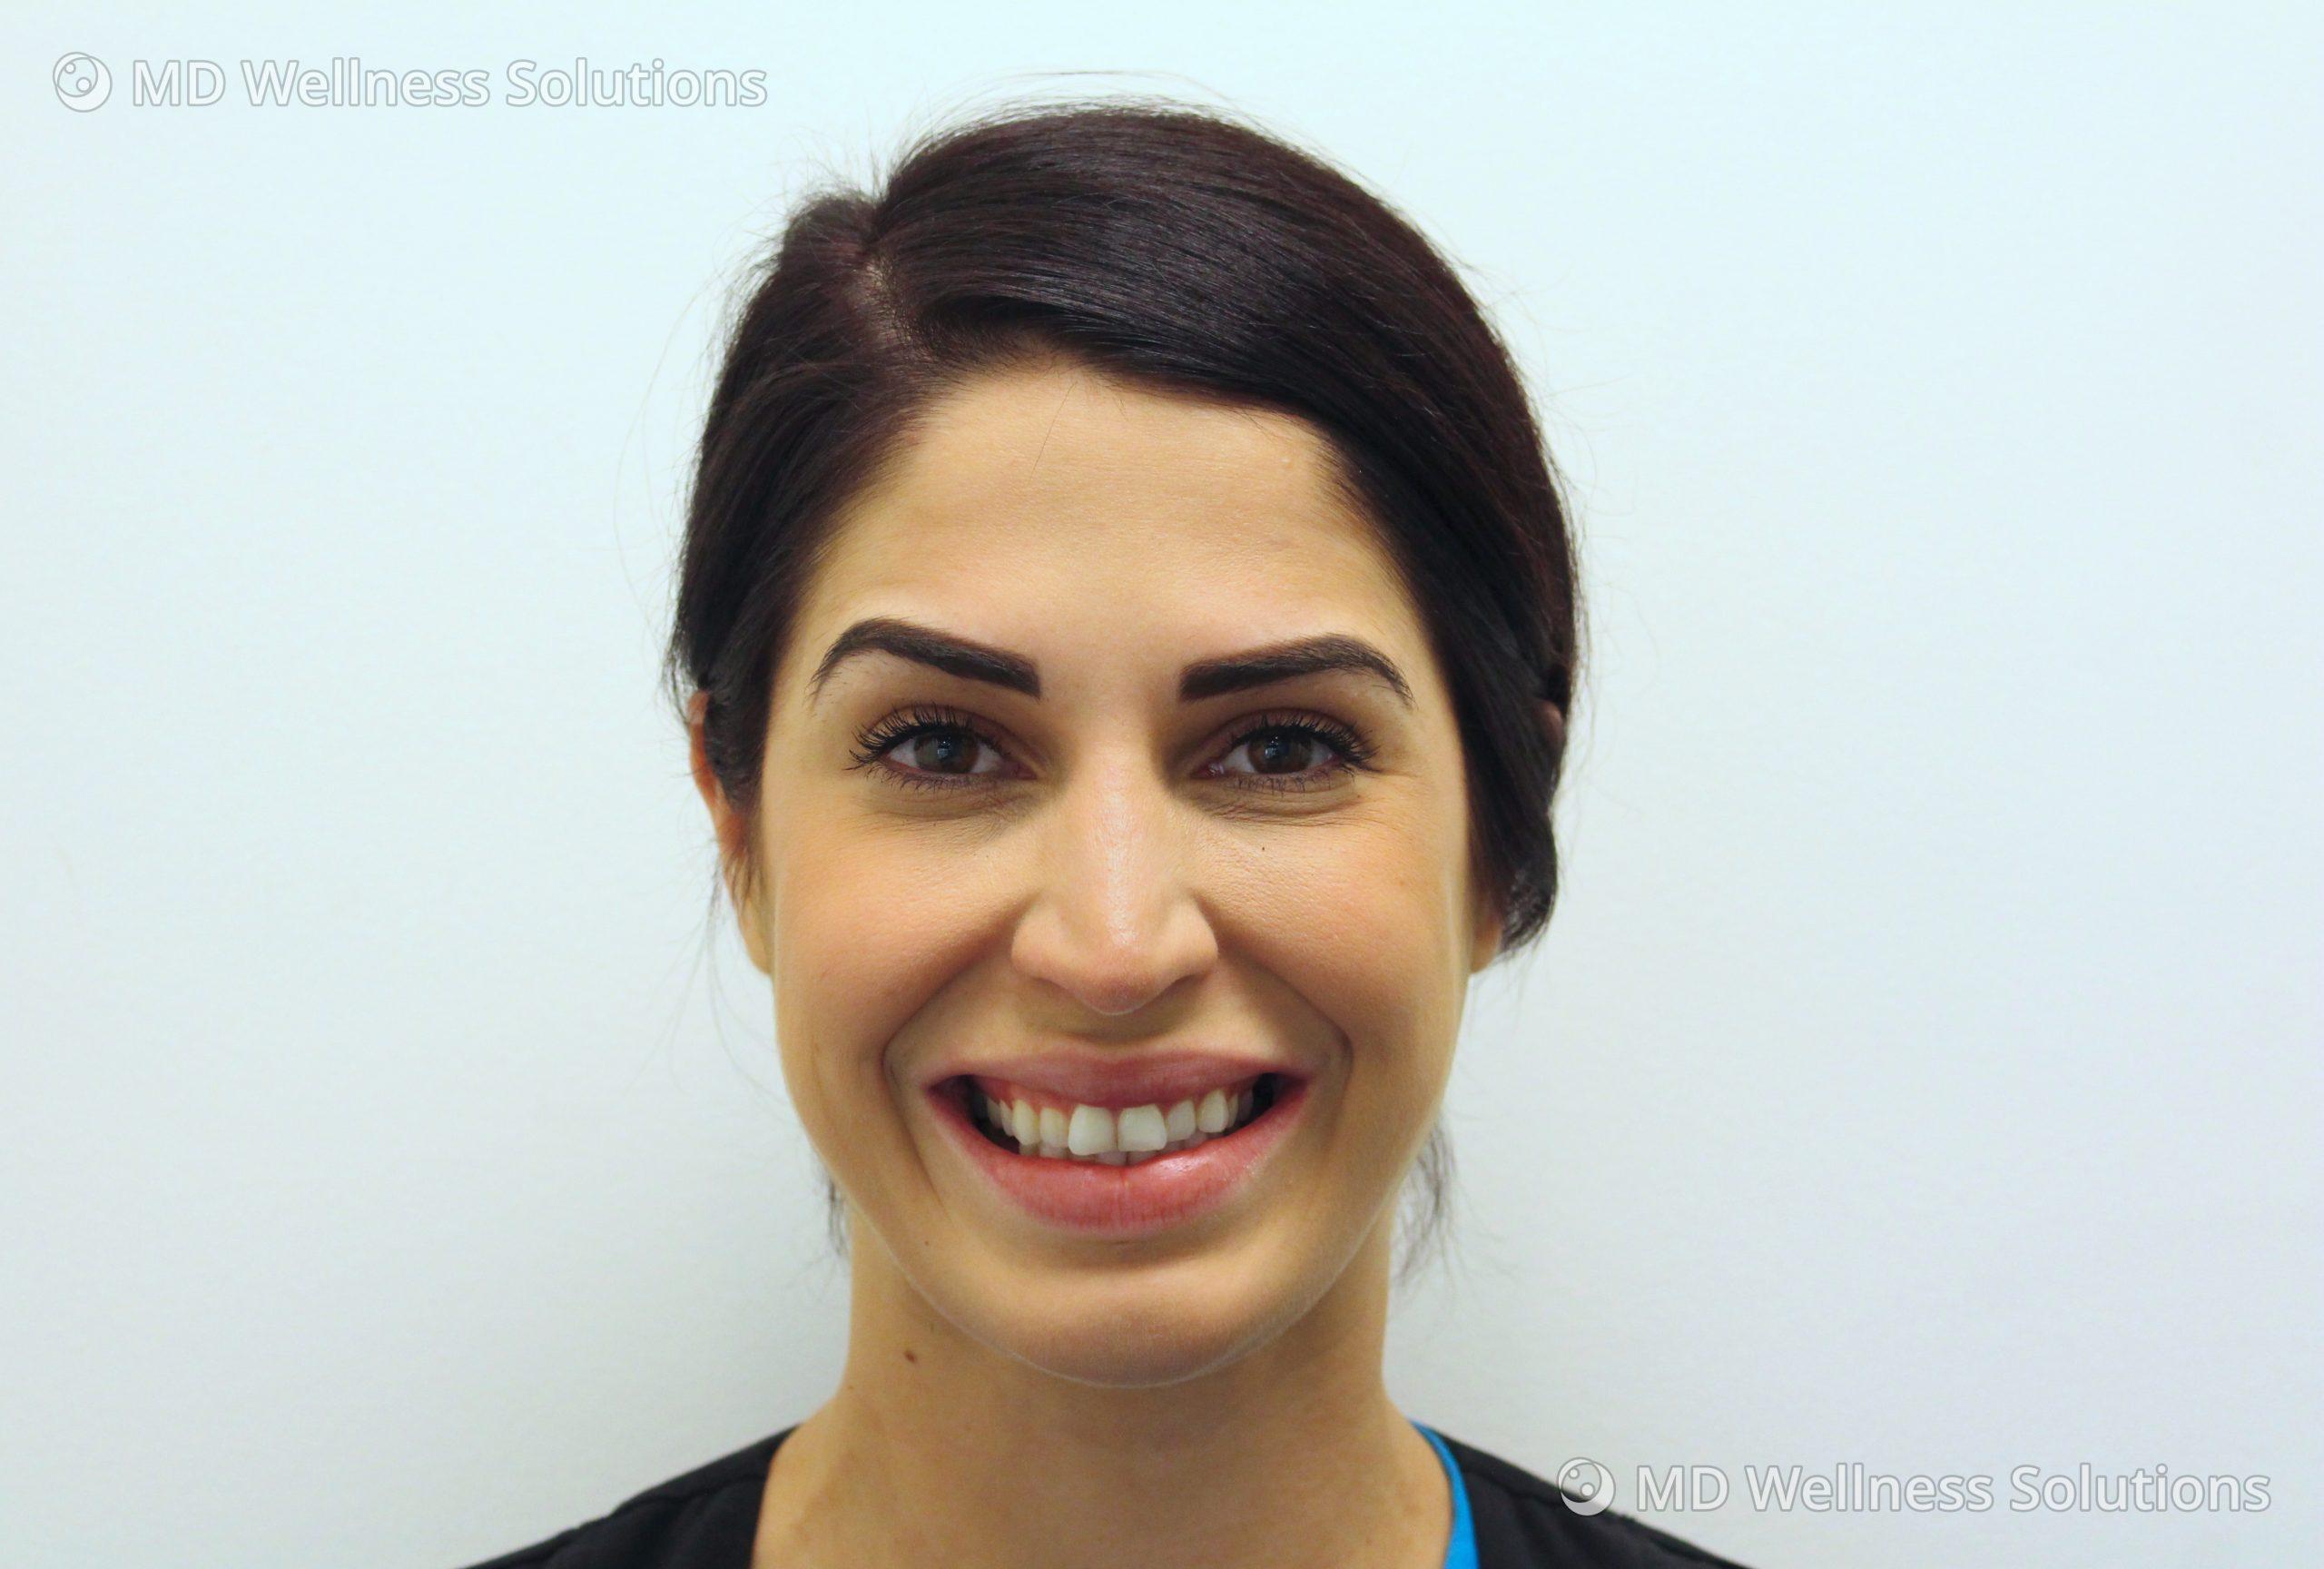 25-34 year old woman before neurotoxin treatment